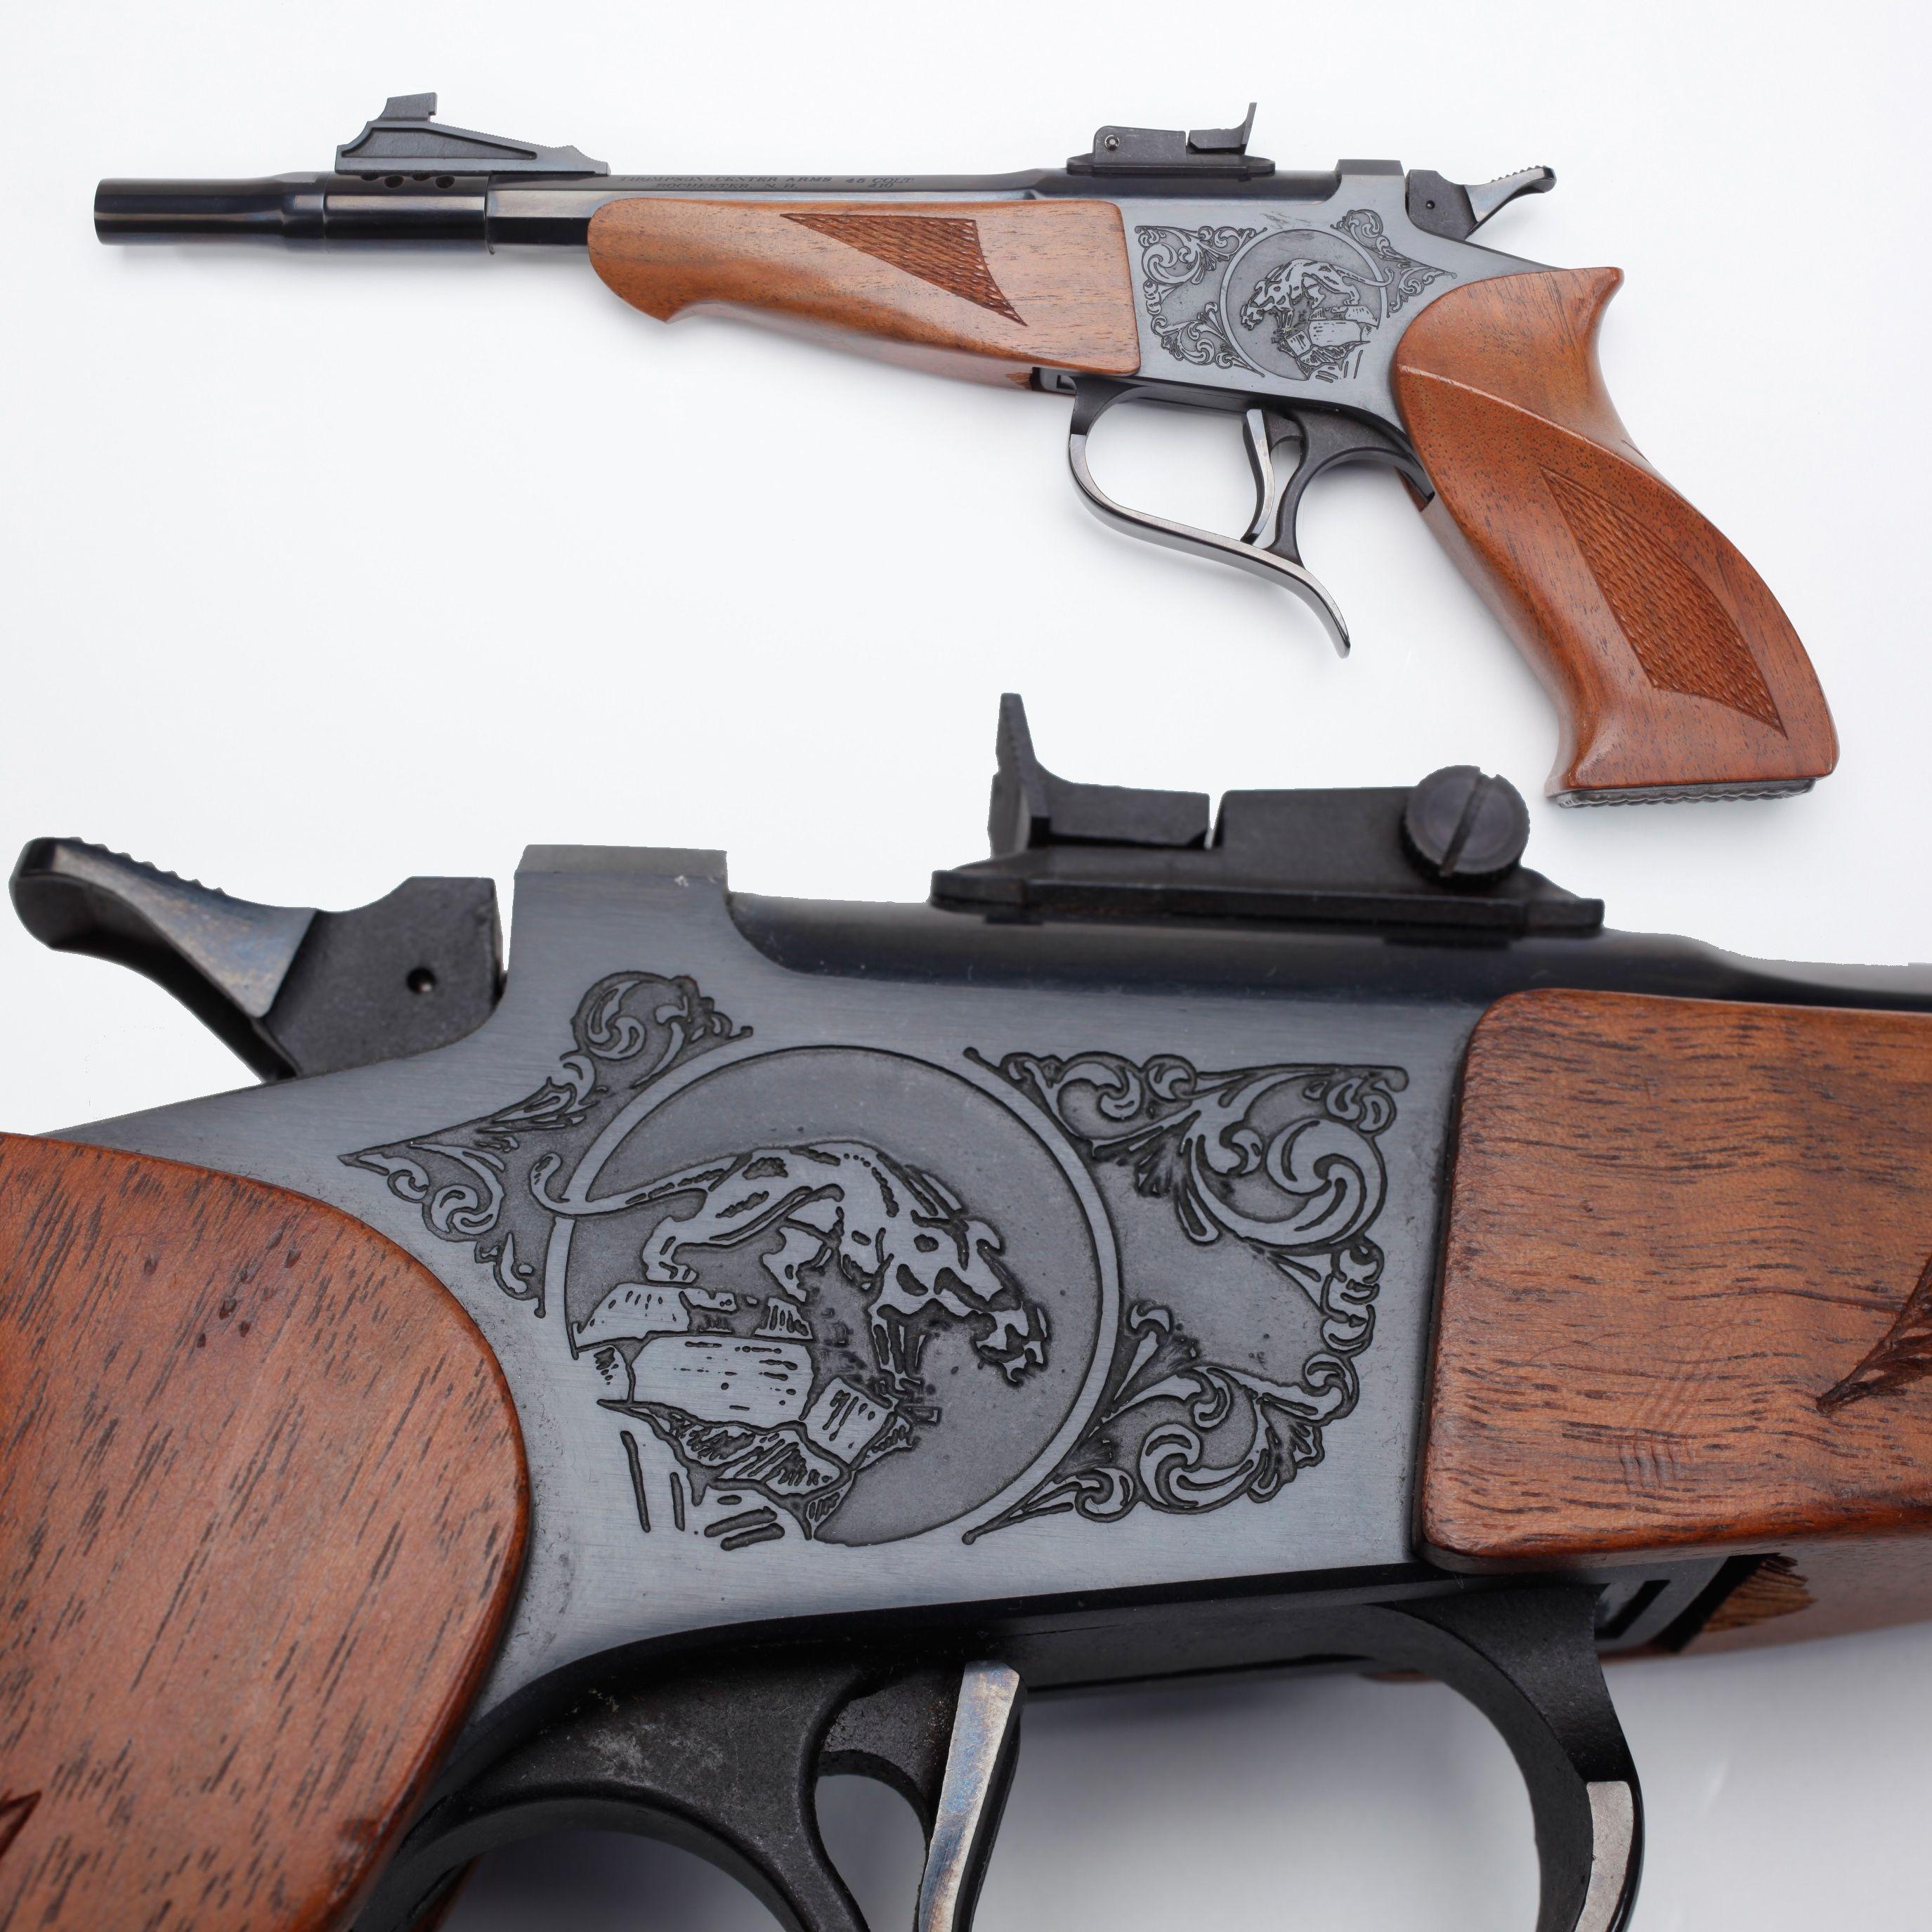 Thompson/Center Contender pistol Now part of Smith